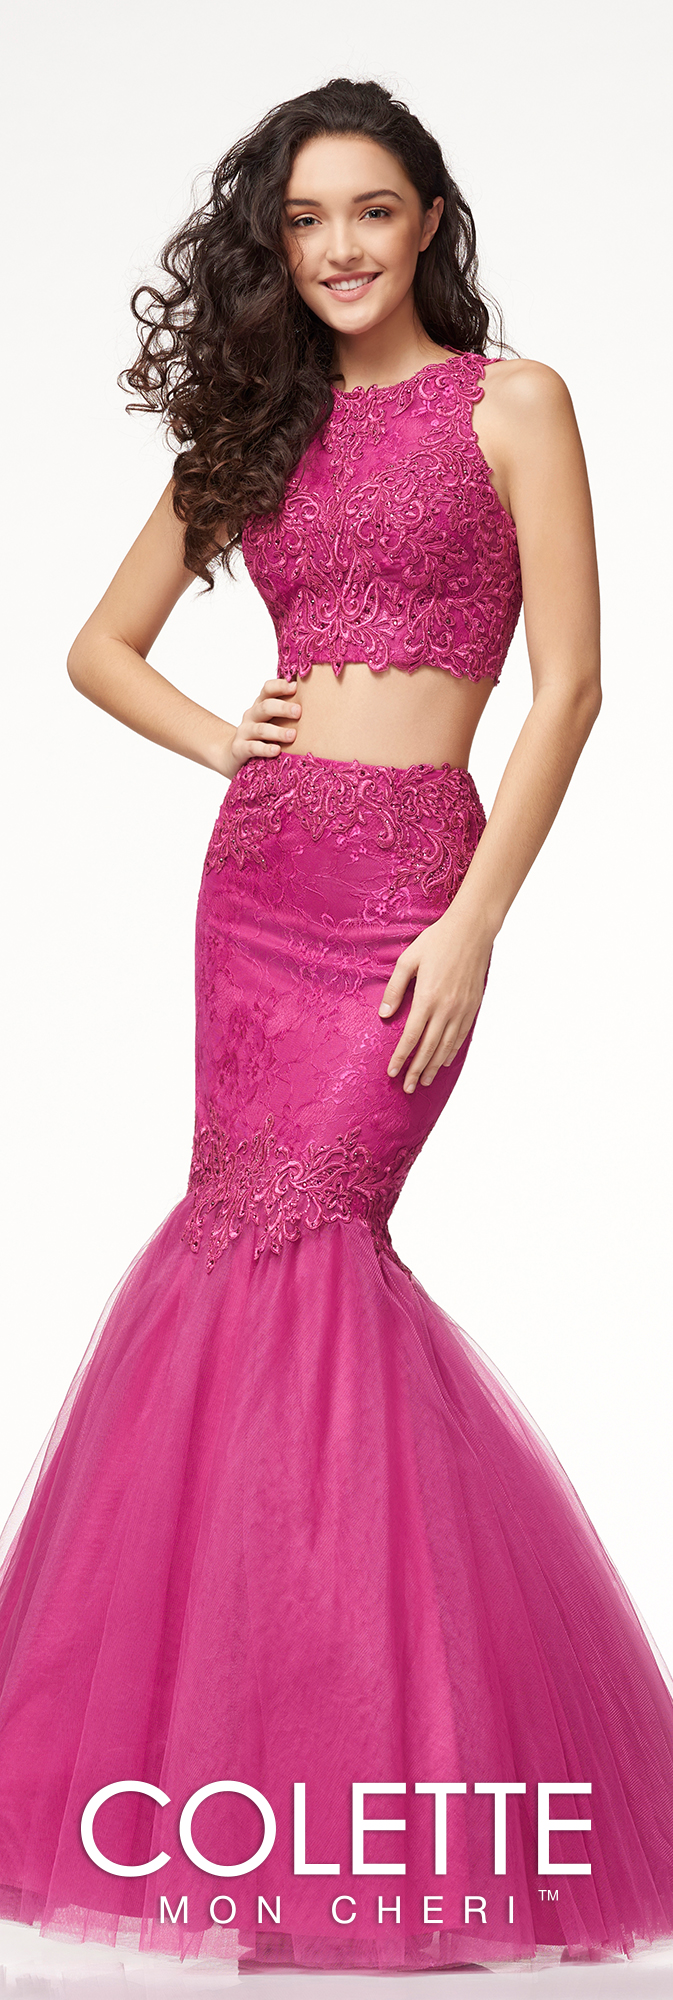 Two piece lace mermaid prom dress colette for mon cheri cl